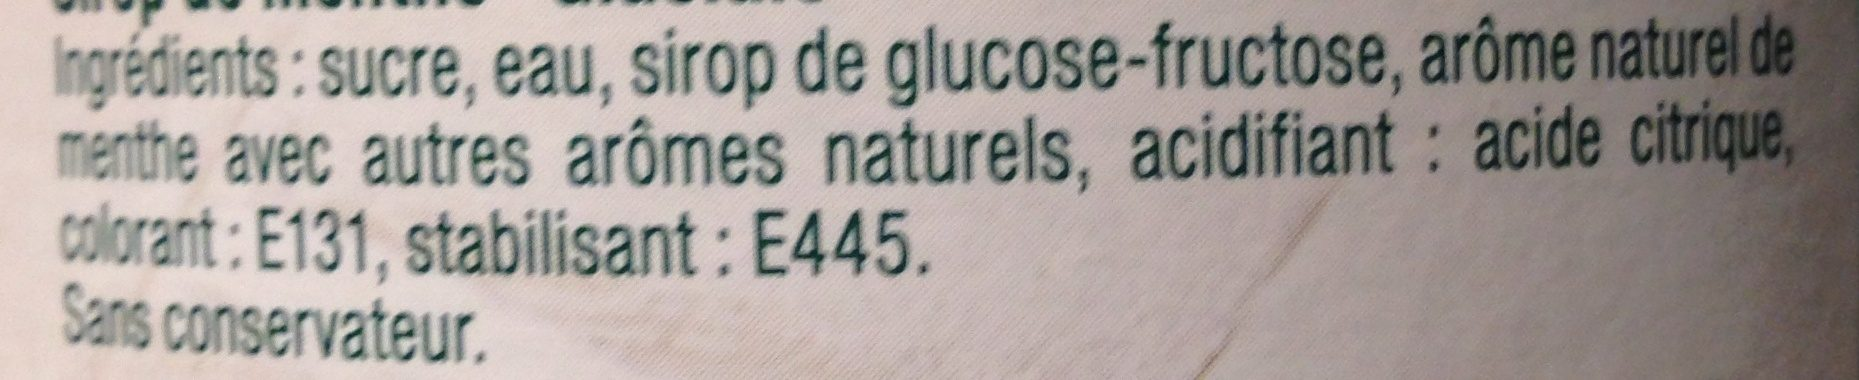 Sirop Menthe Glaciale - Ingrédients - fr